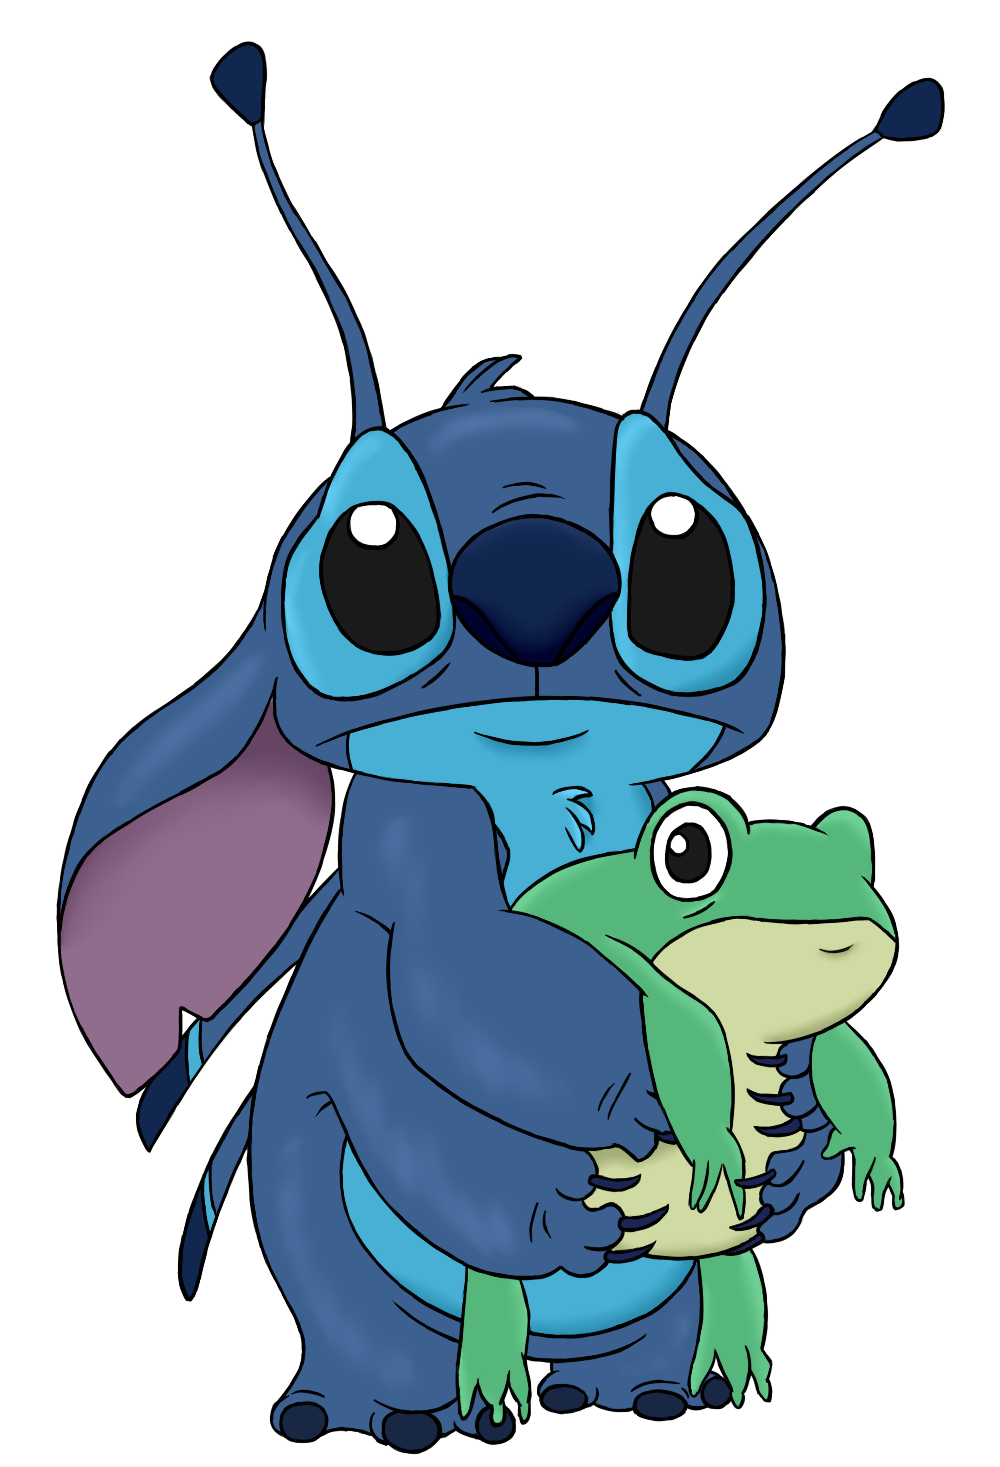 Stitch clipart pelekai. Lilo drawing character transprent